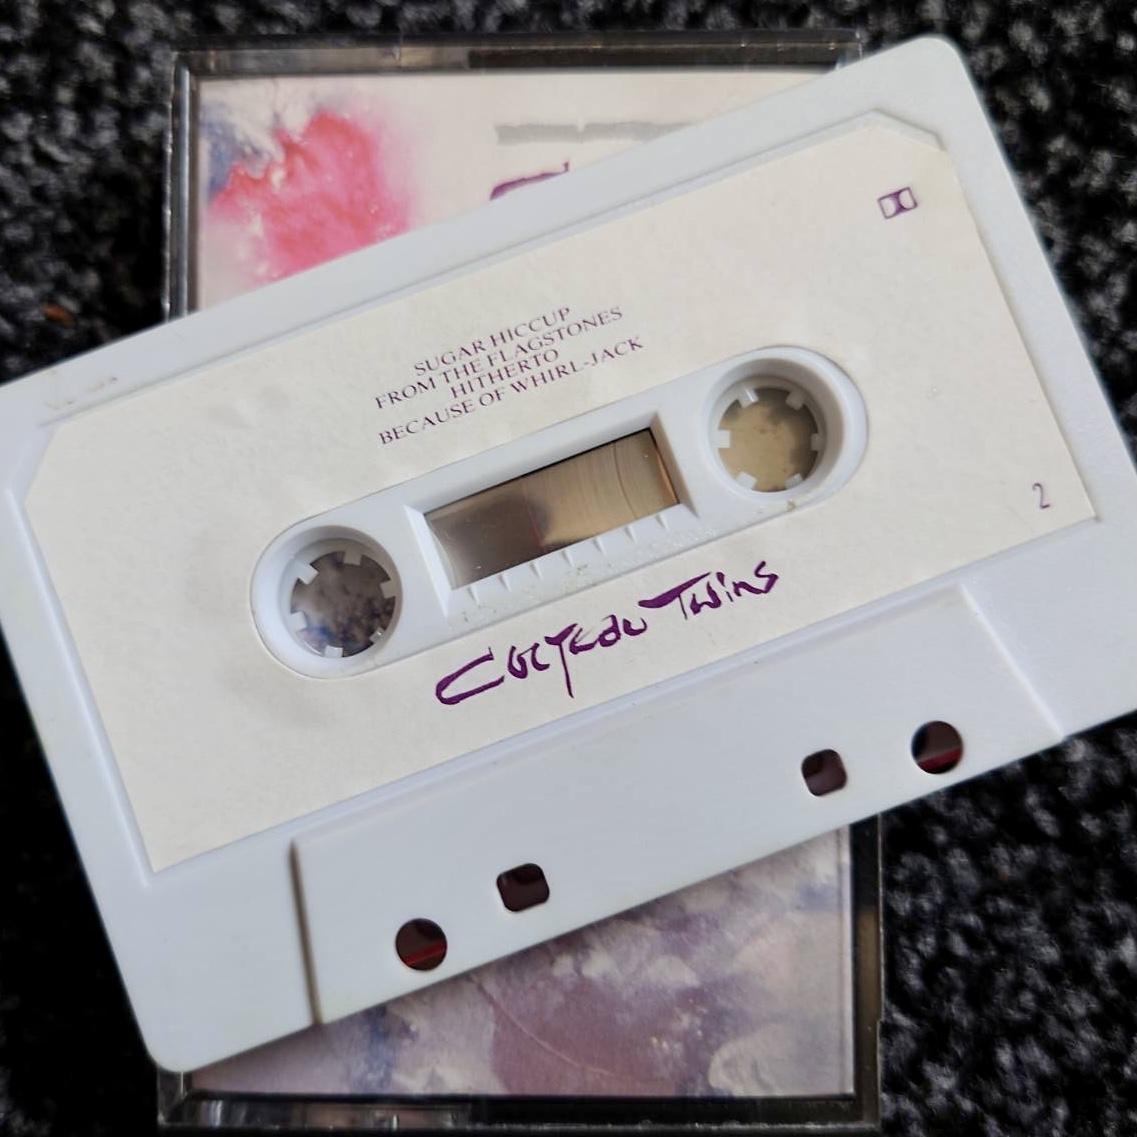 Cocteau Twins 'Head Over Heels' / 'Sunburst and Snowblind' 1983 UK cassette side two